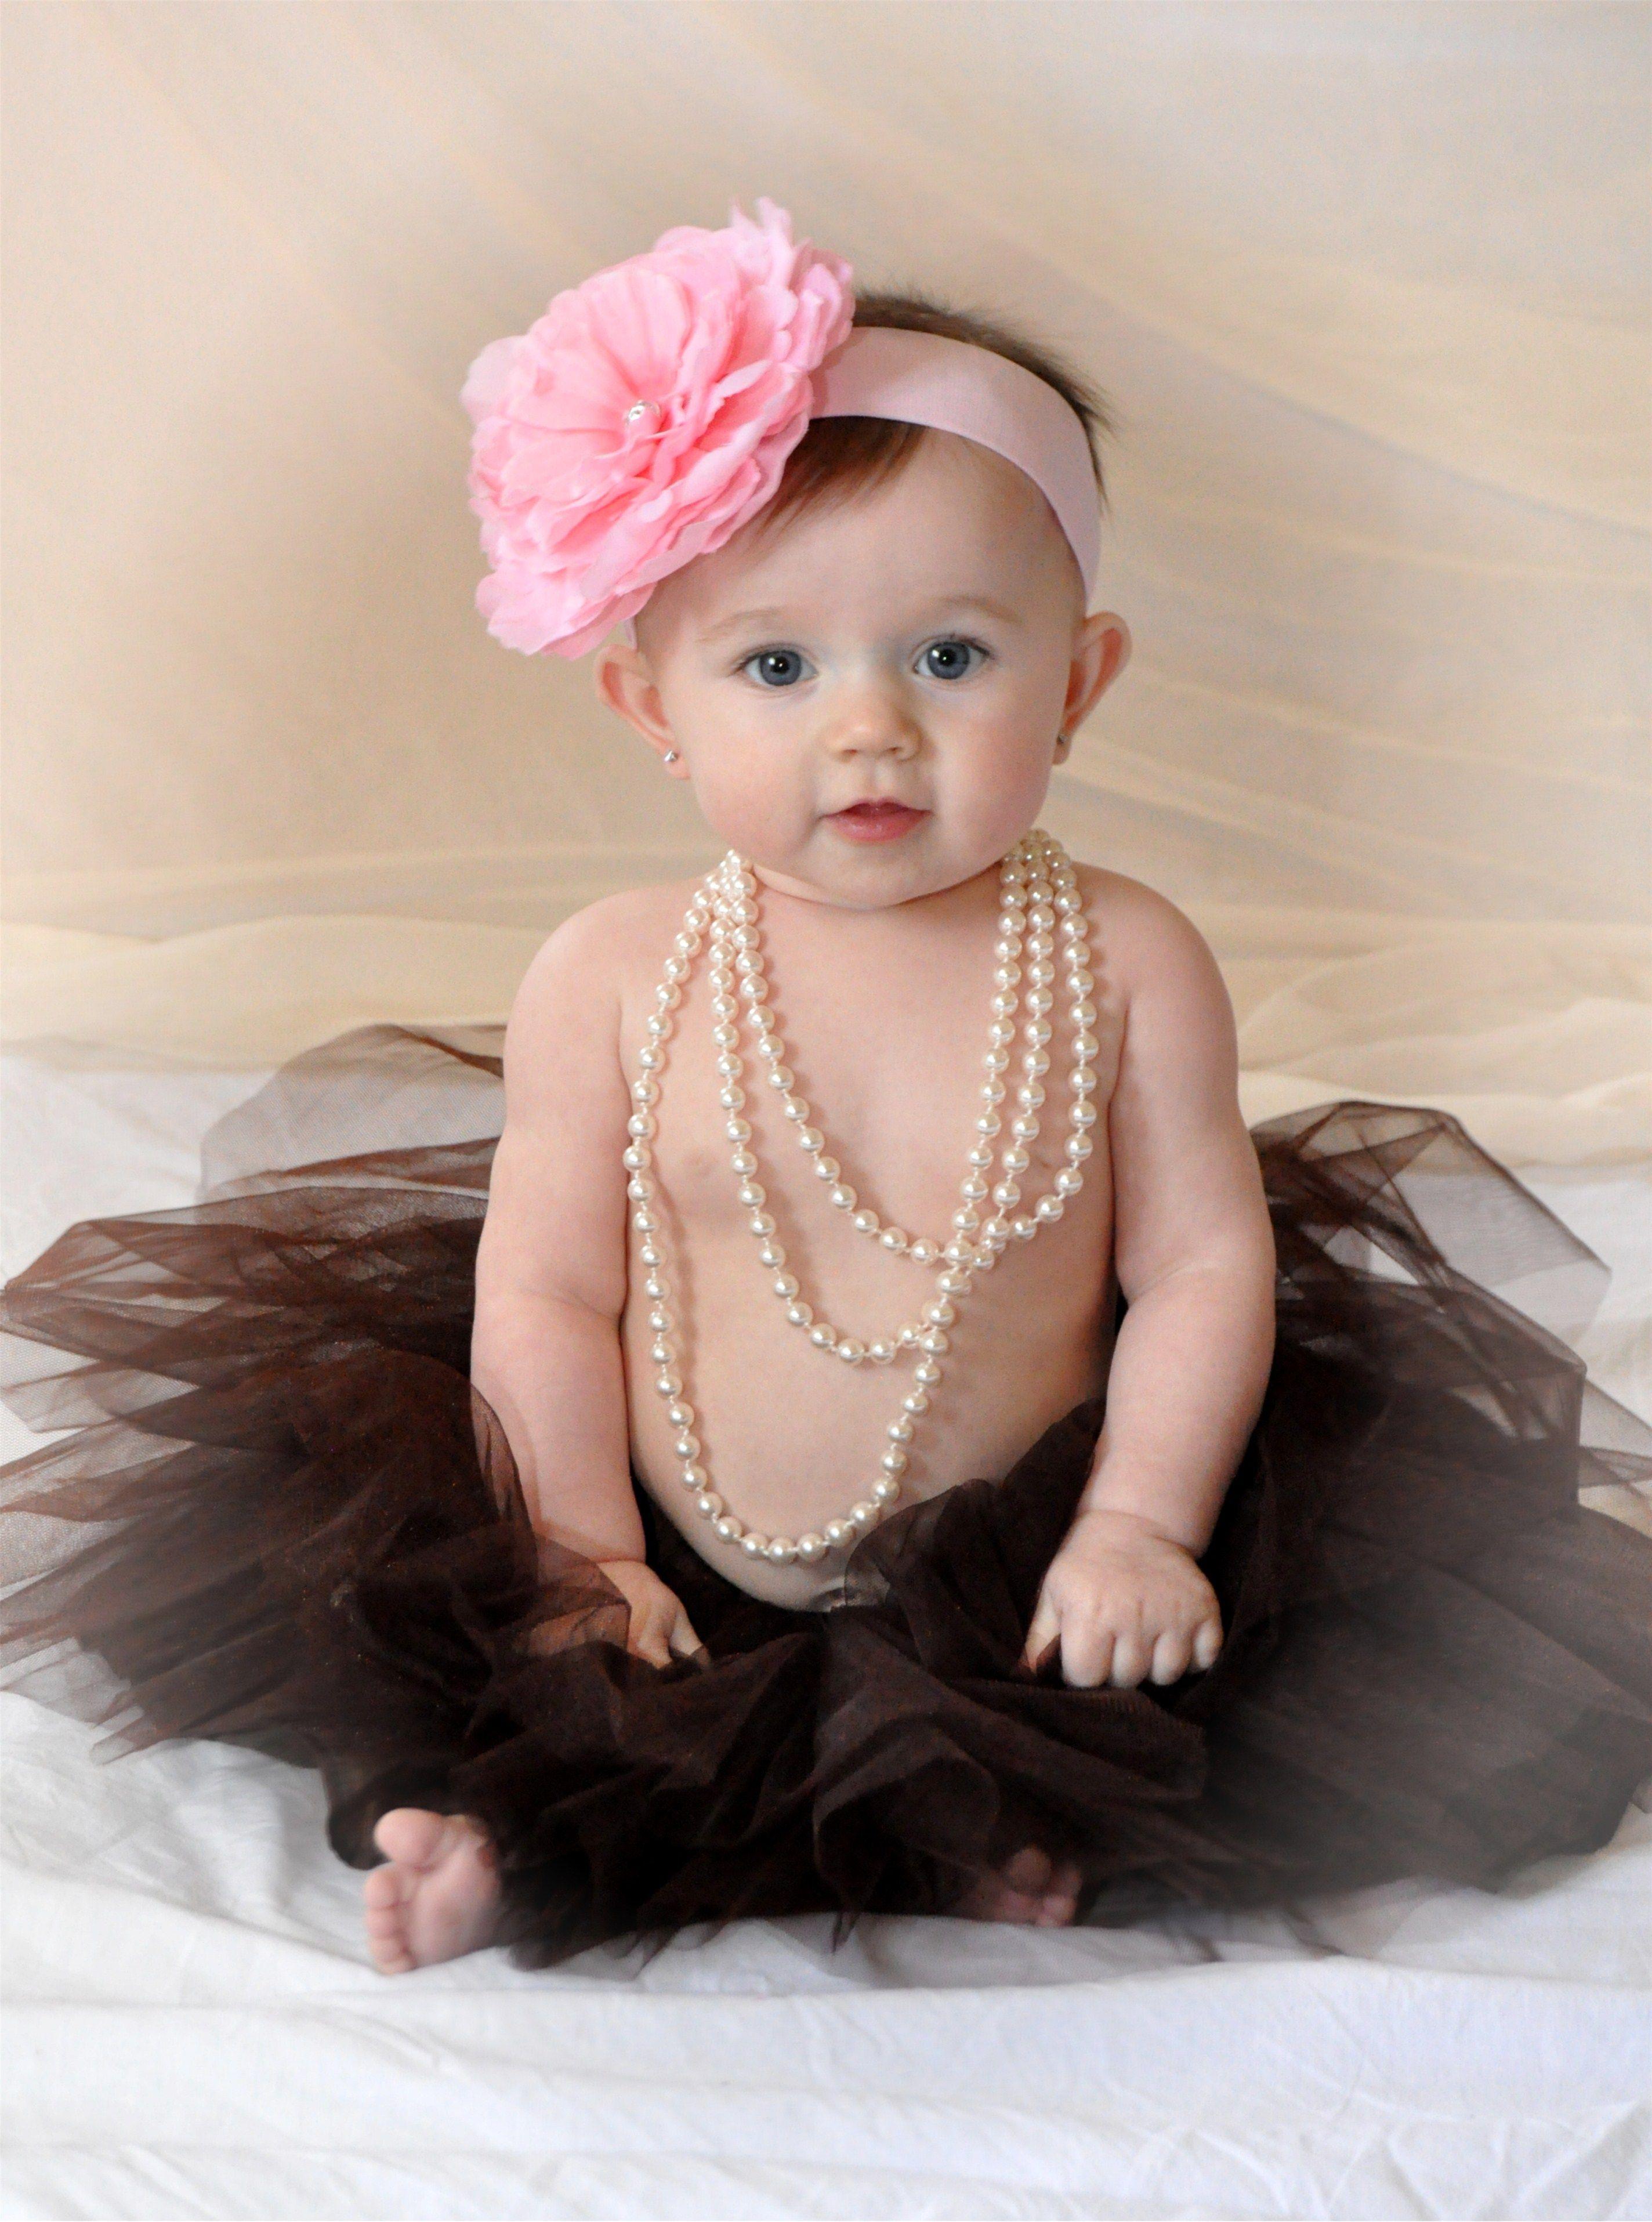 Baby photo with tutu